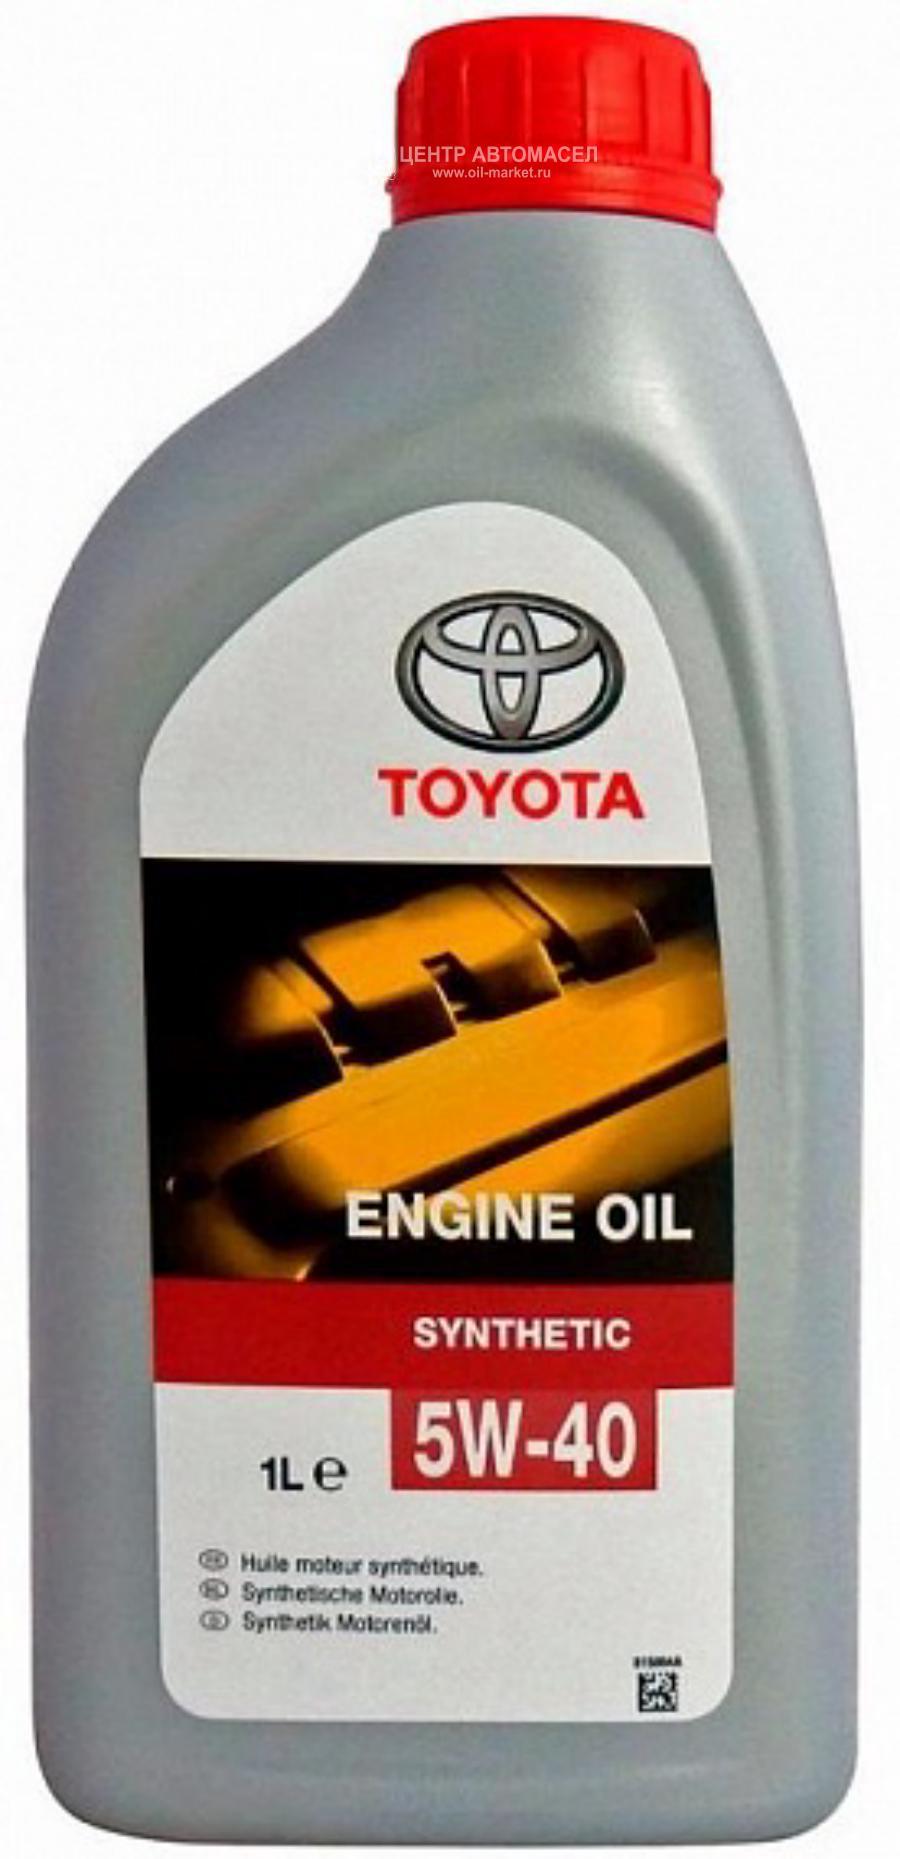 Масло моторное синтетическое ENGINE OIL 5W-40, 1л